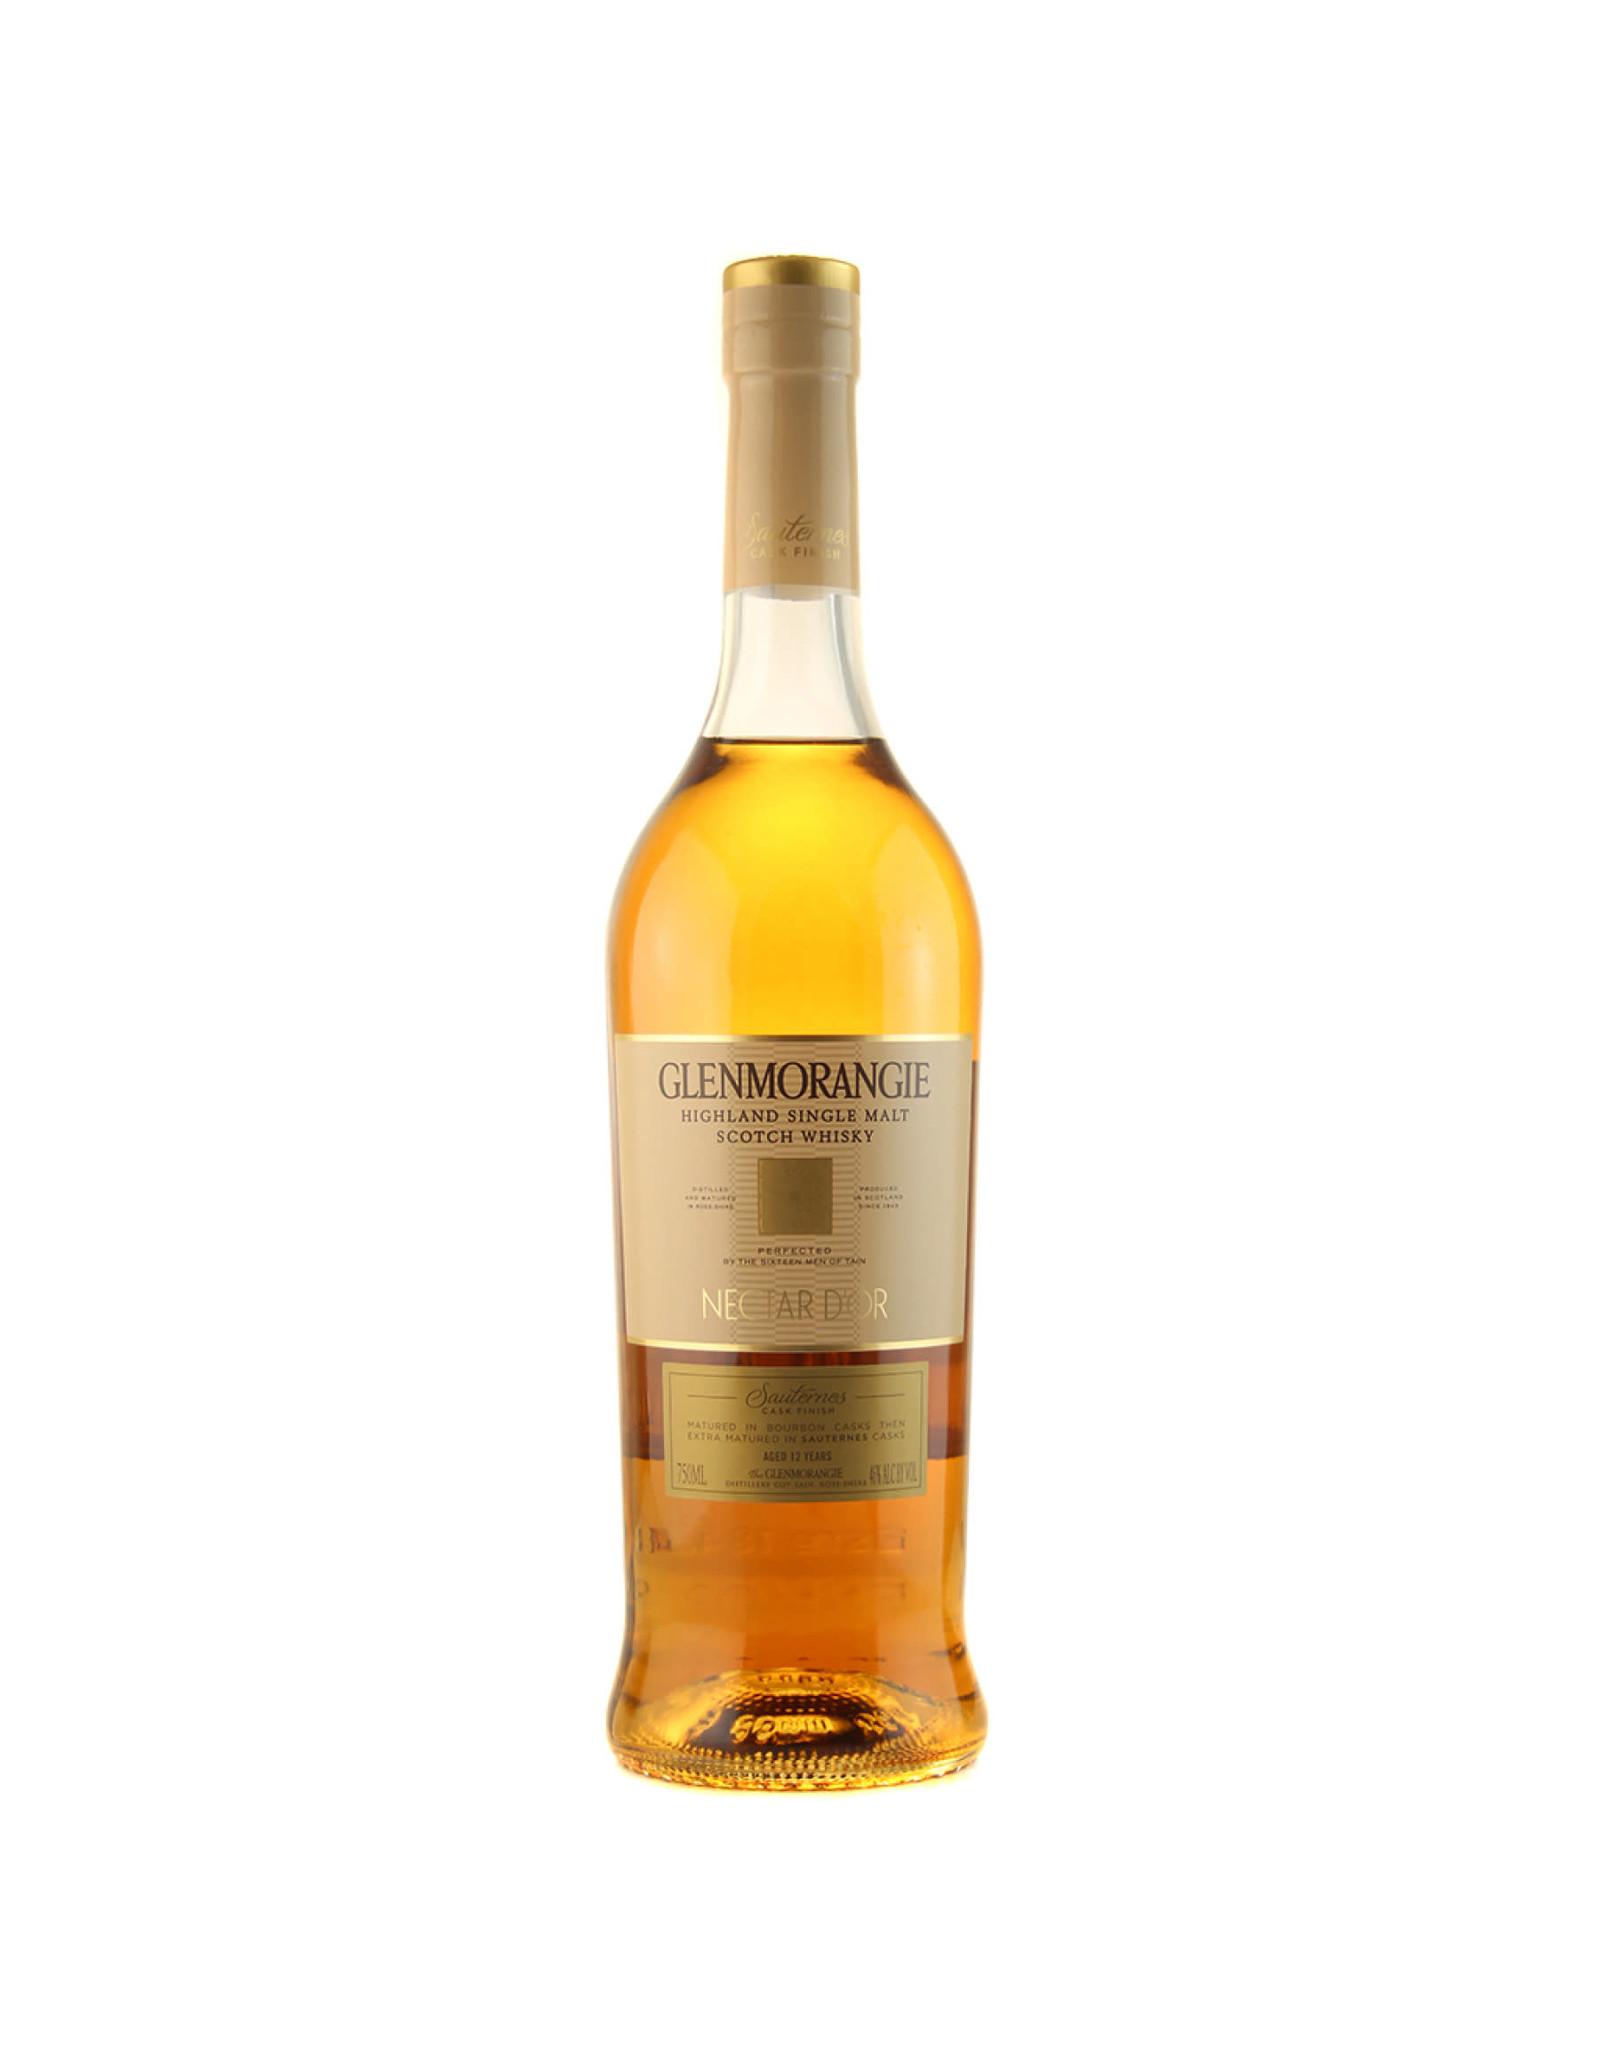 Glenmorangie Nectar D'Or Sauternes Cask Finish